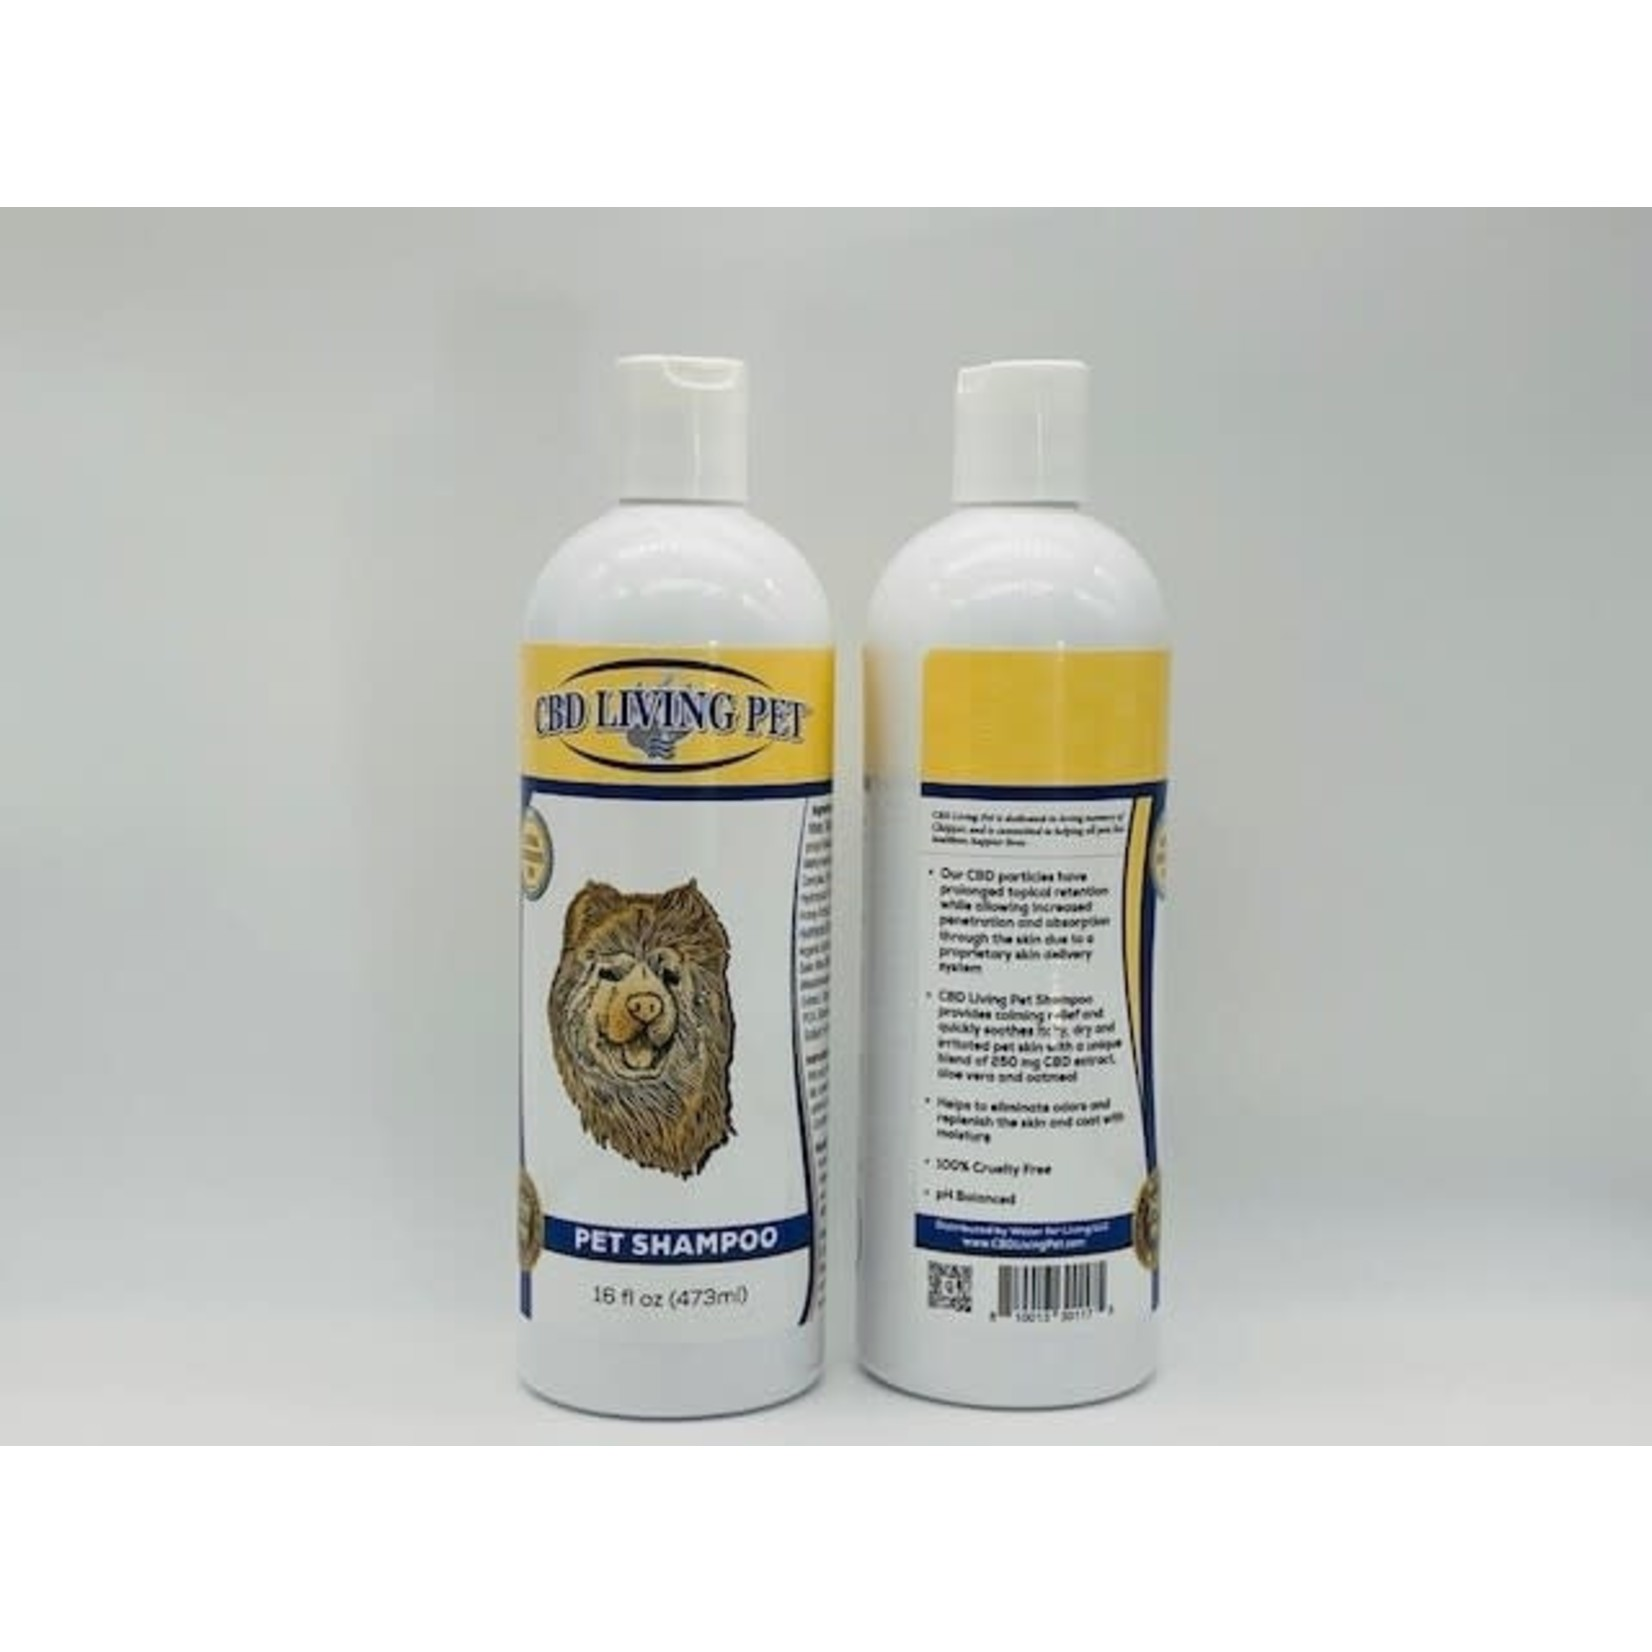 CBD Living CBDL Pet Shampoo 250mg